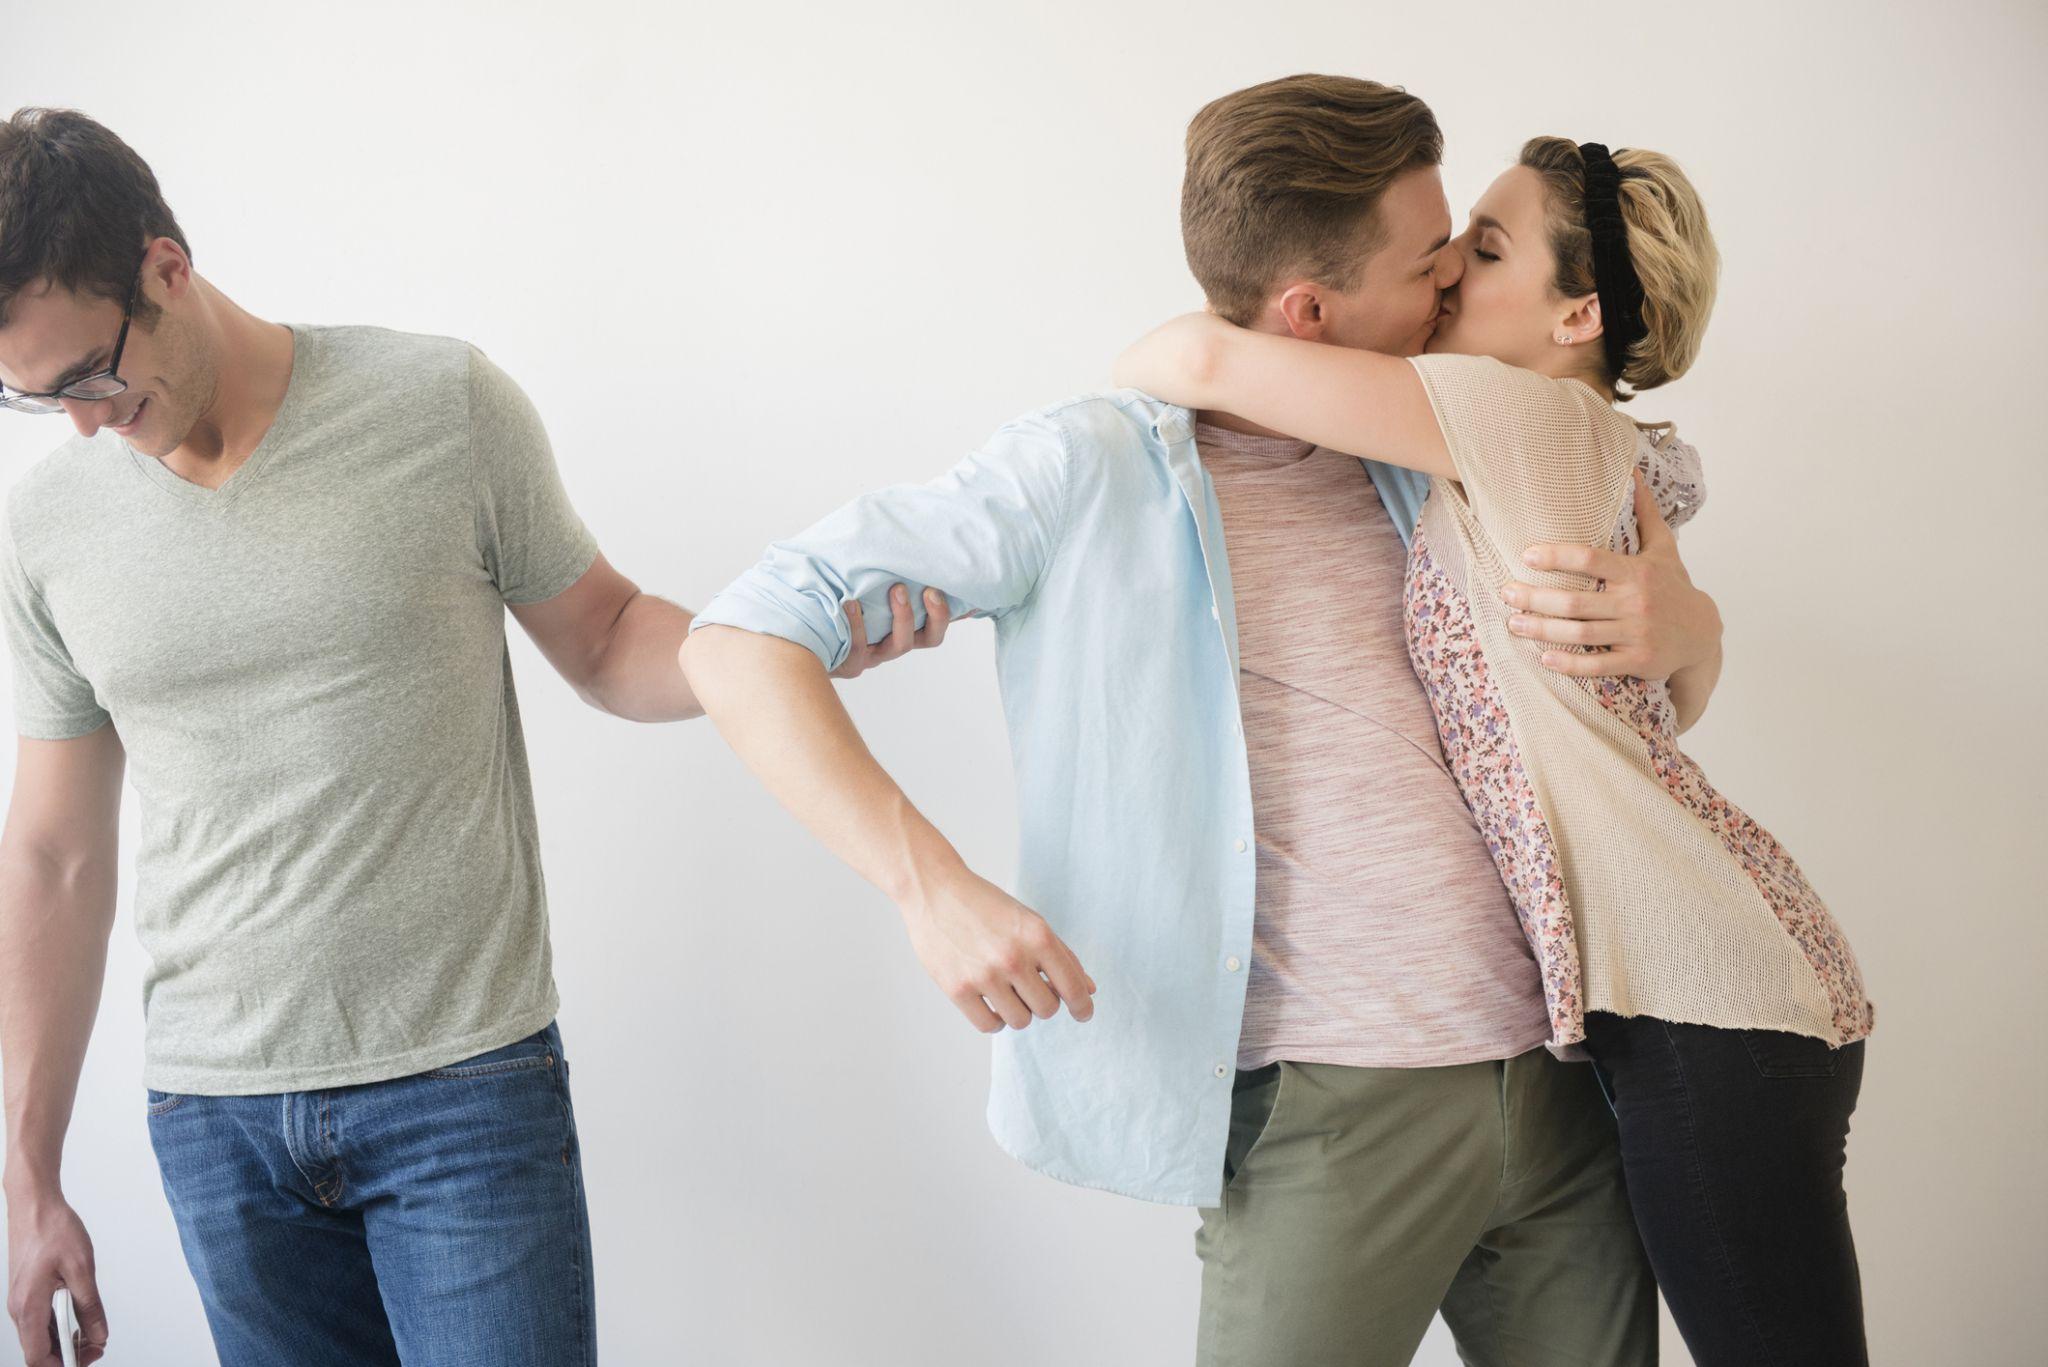 Men who use dear in online dating